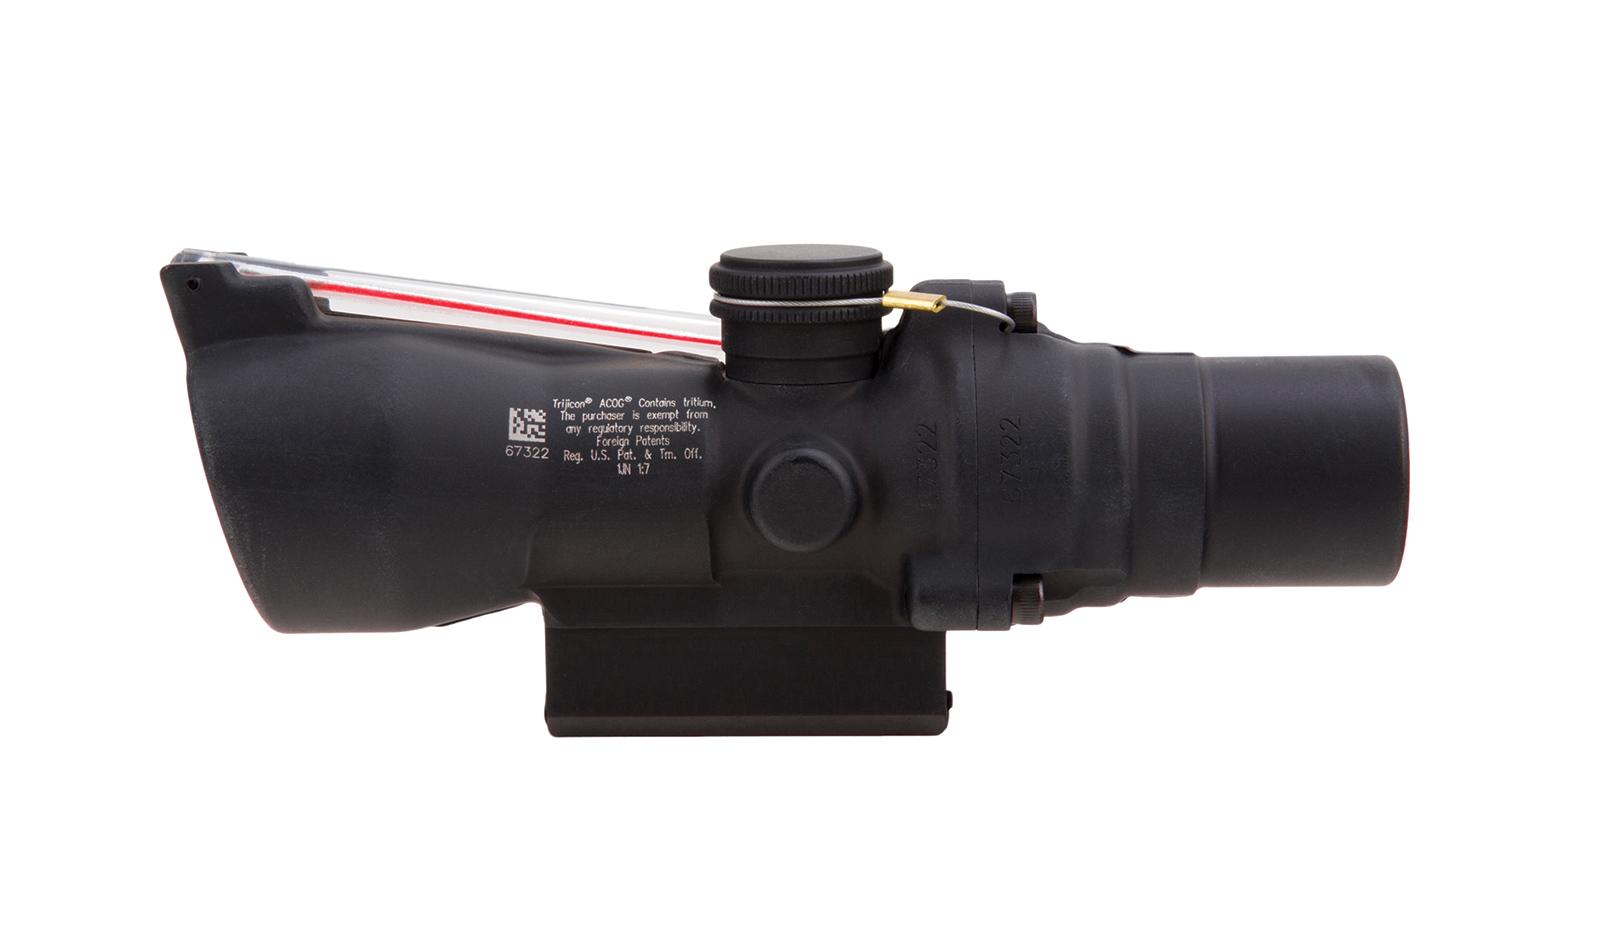 TA47-C-400151 angle 2